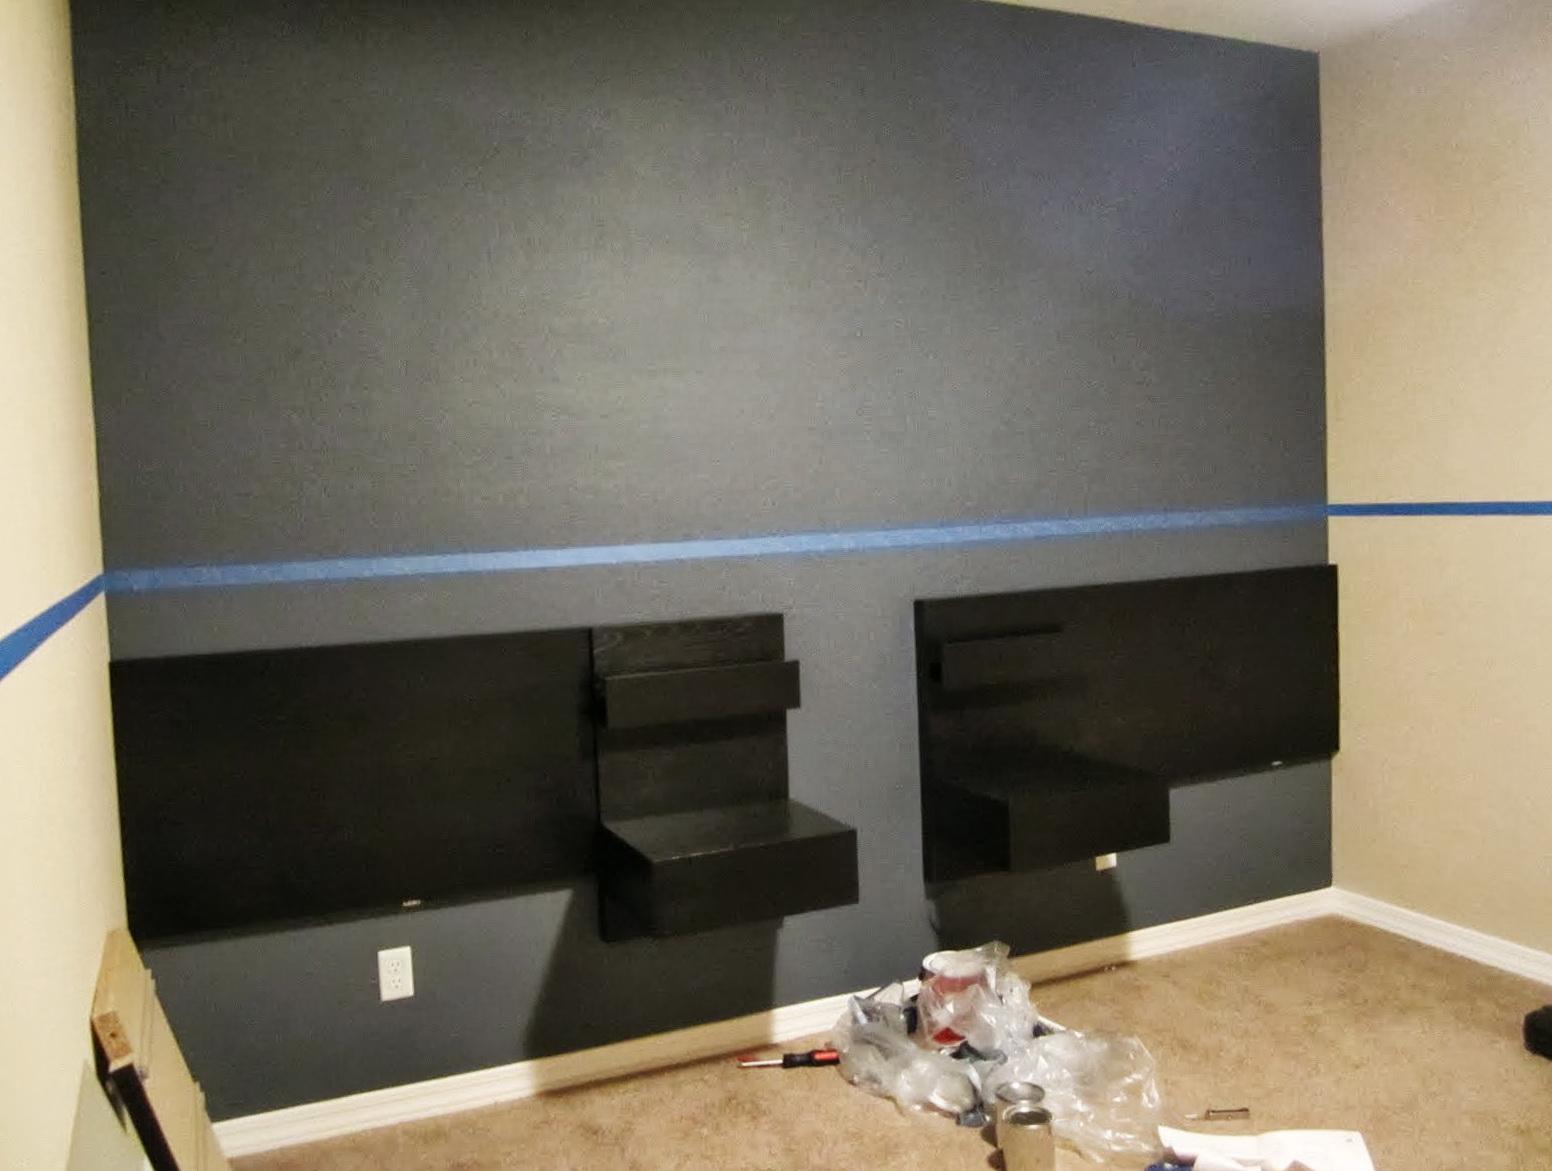 Ikea Malm Headboard Pull Out Bed Shelf